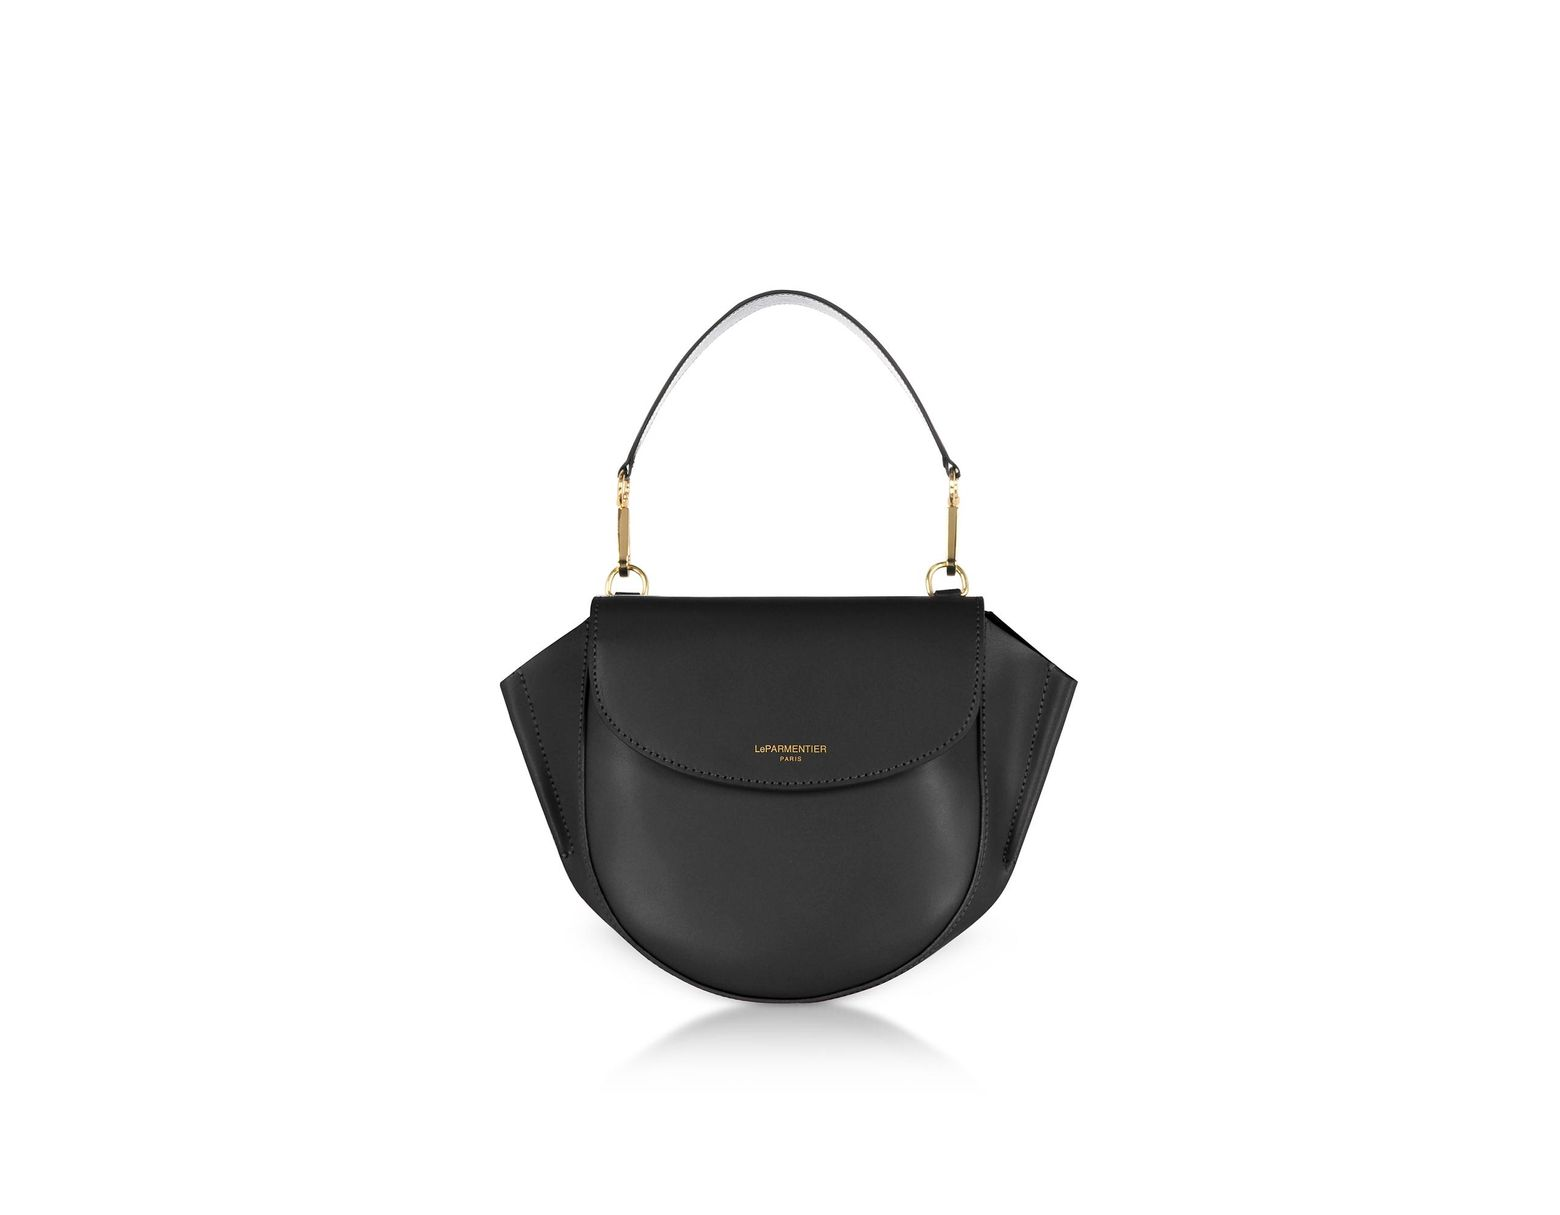 6a2528f9cd Le Parmentier Astorya Leather Mini Bag W/shoulder Strap in Black - Lyst